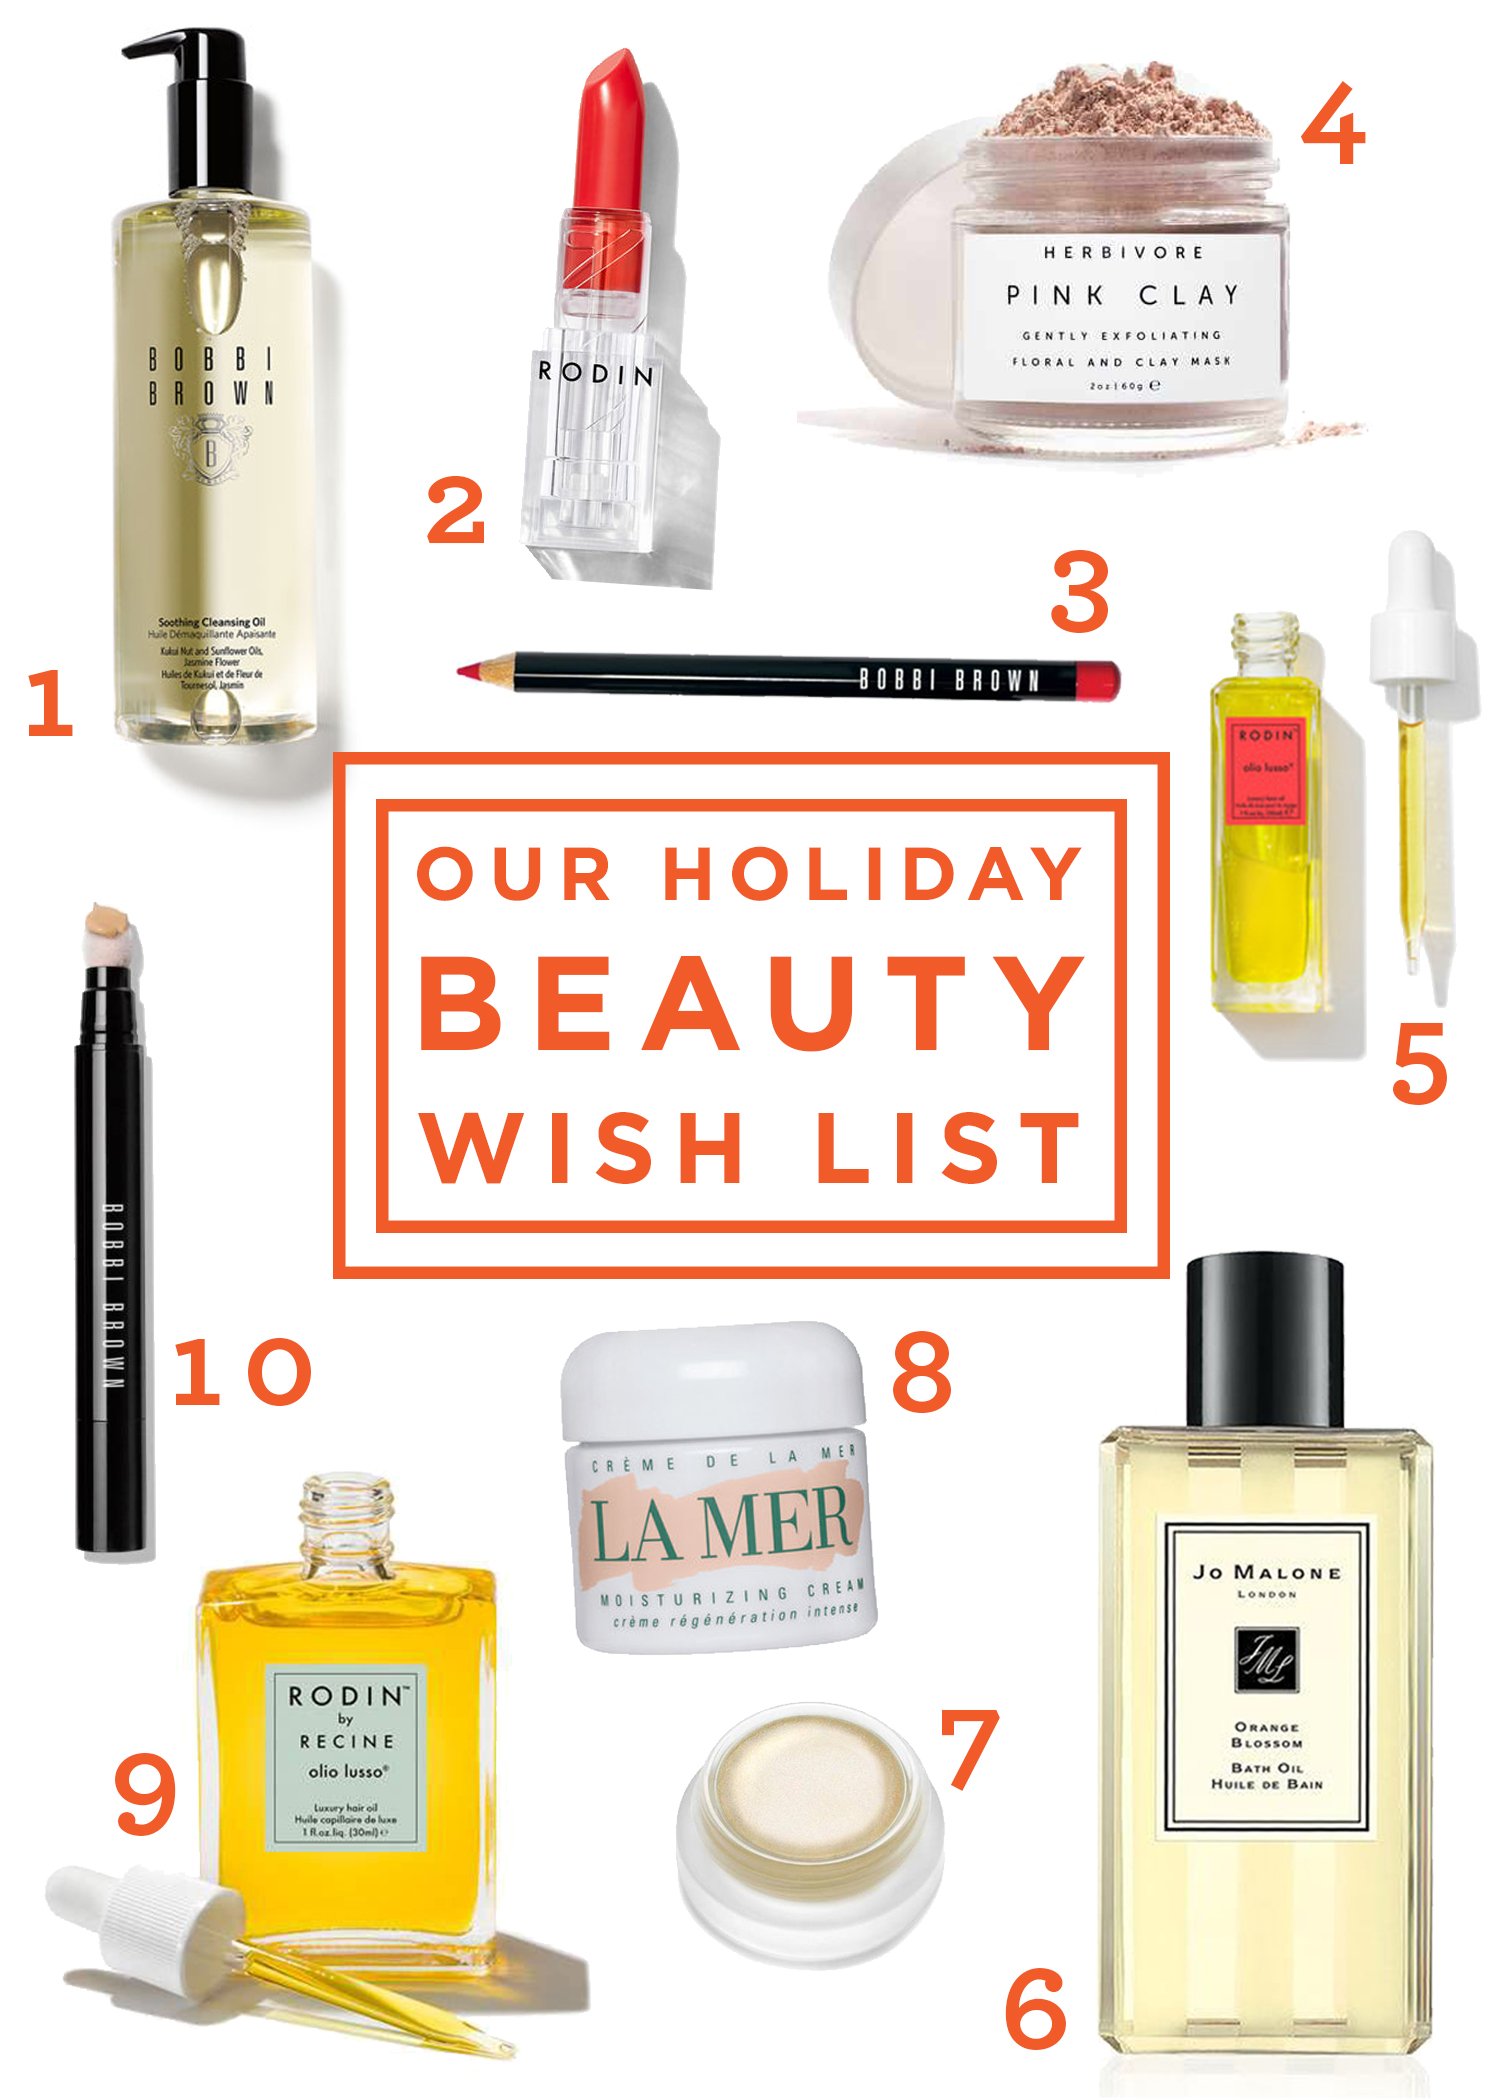 Pencil & Paper Co Beauty Wish List